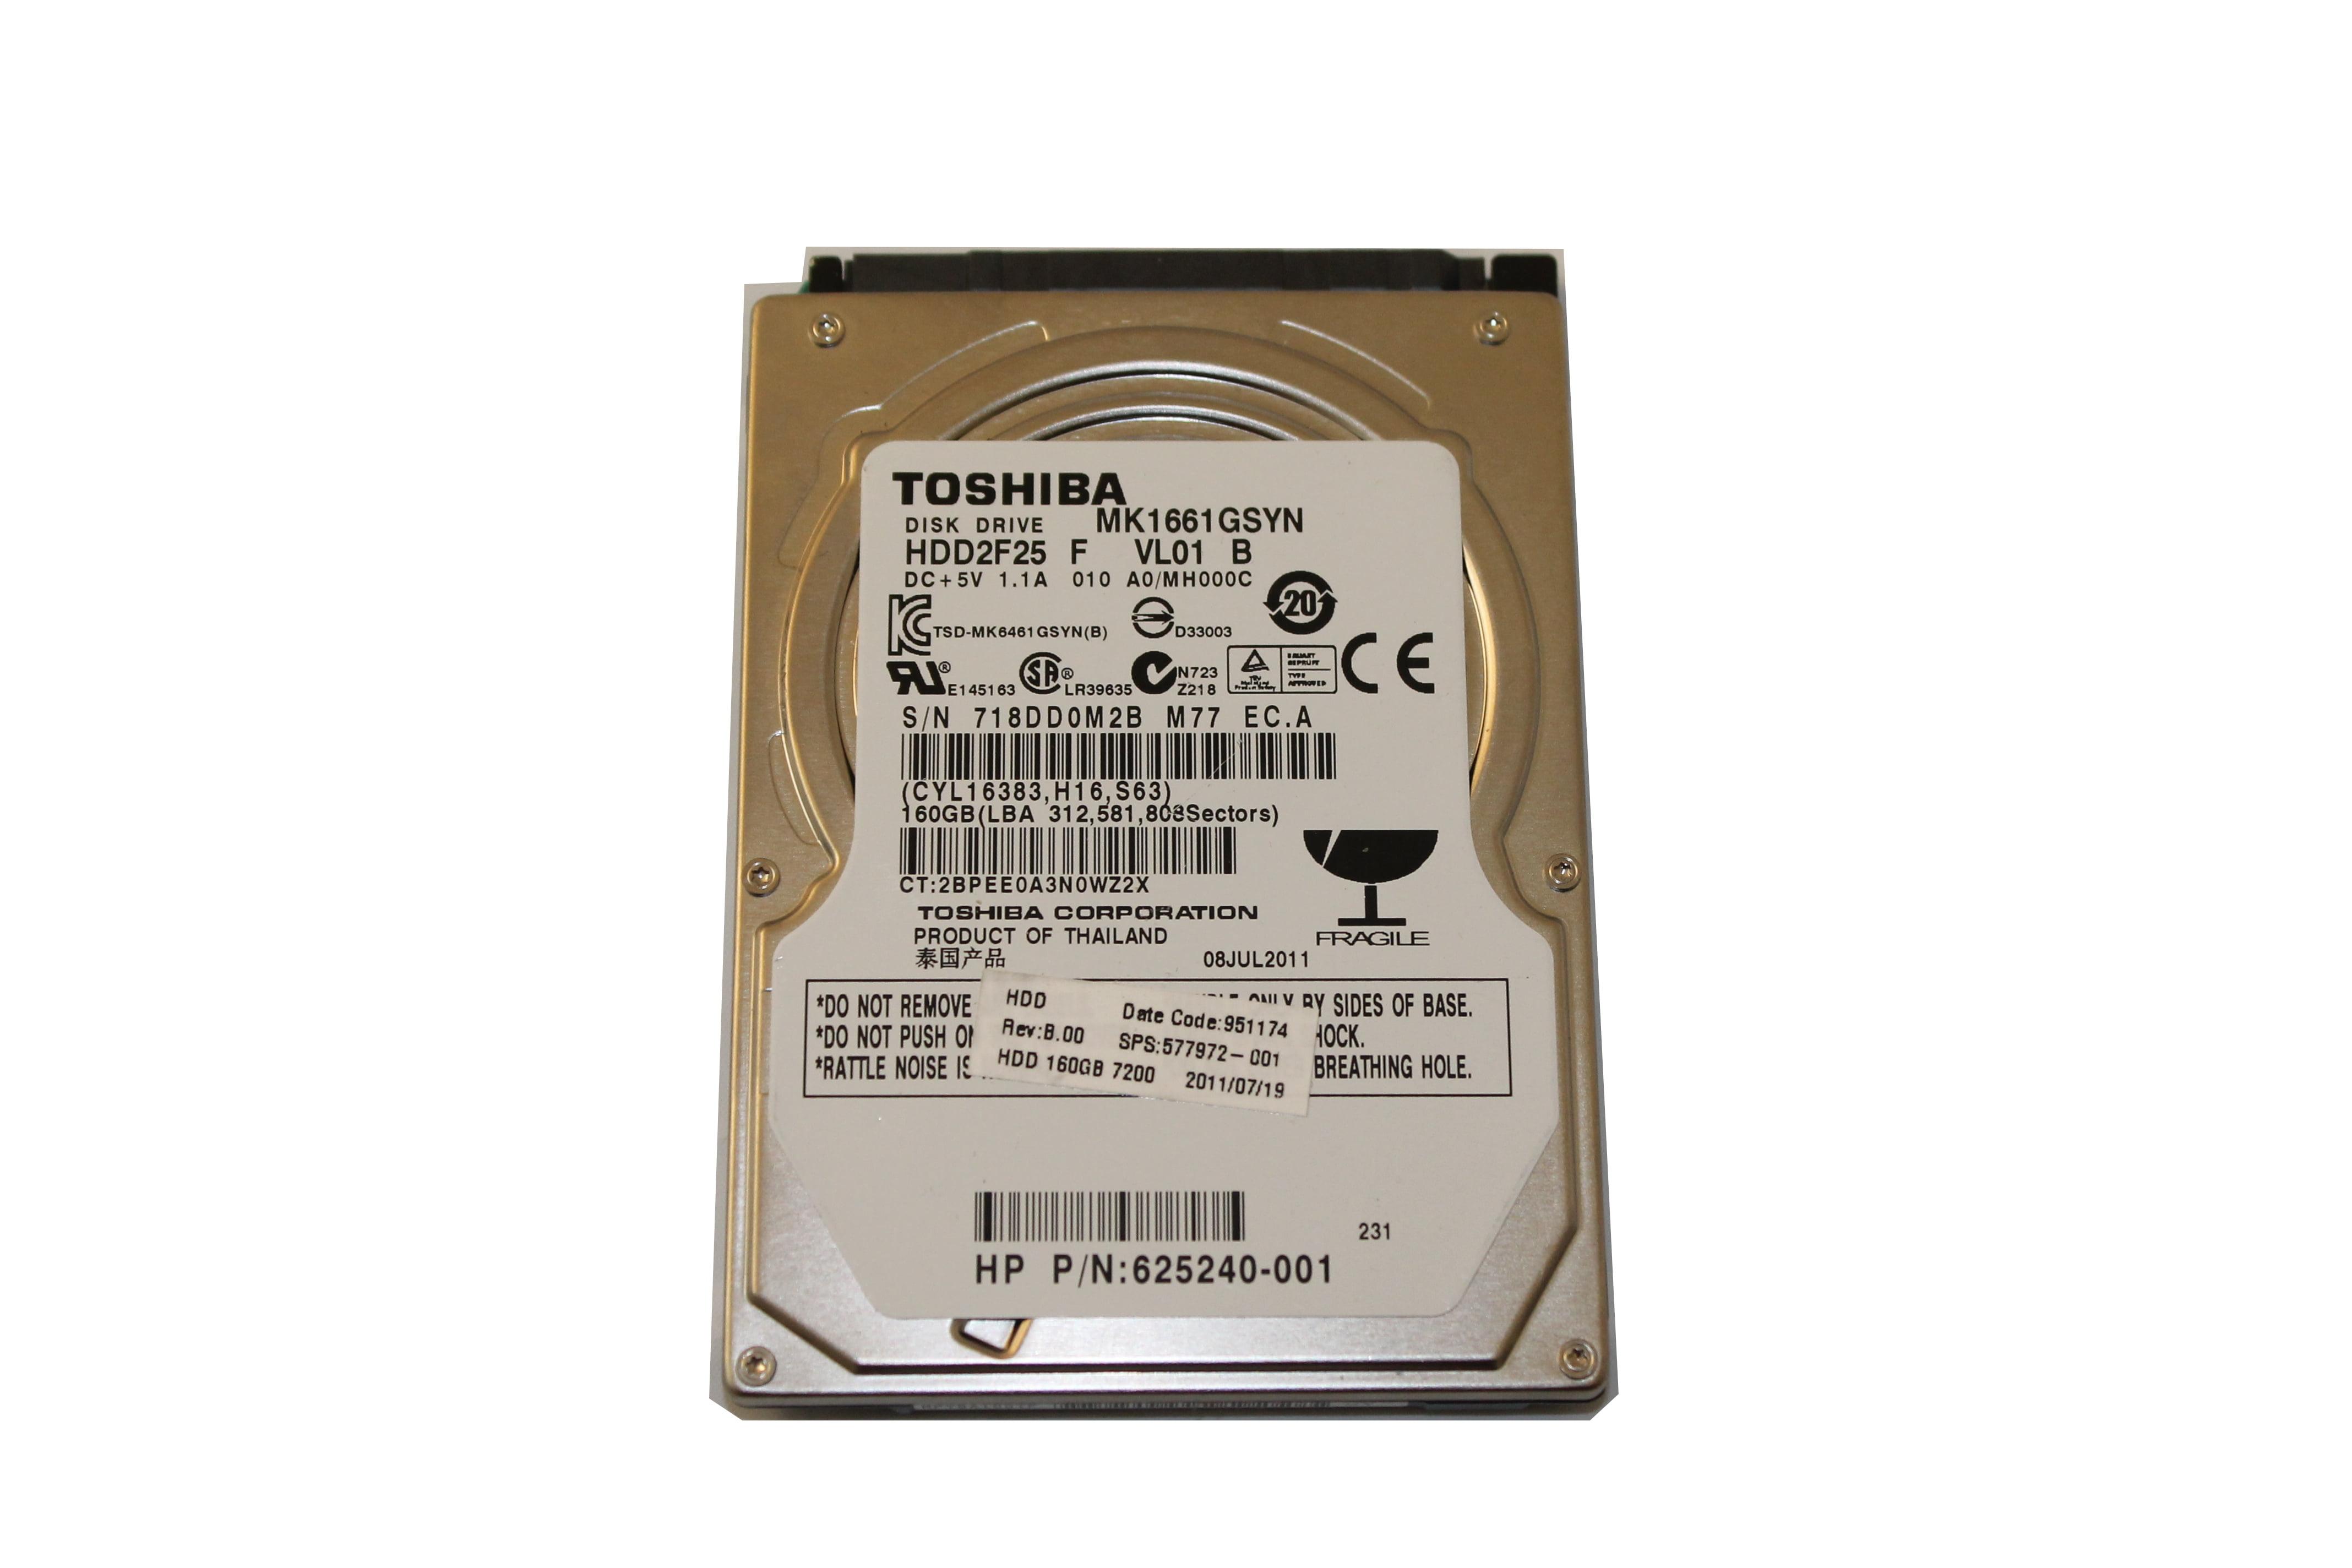 Toshiba MK1661GSYN 160 GB Internal Hard Drive MK1661GSYN